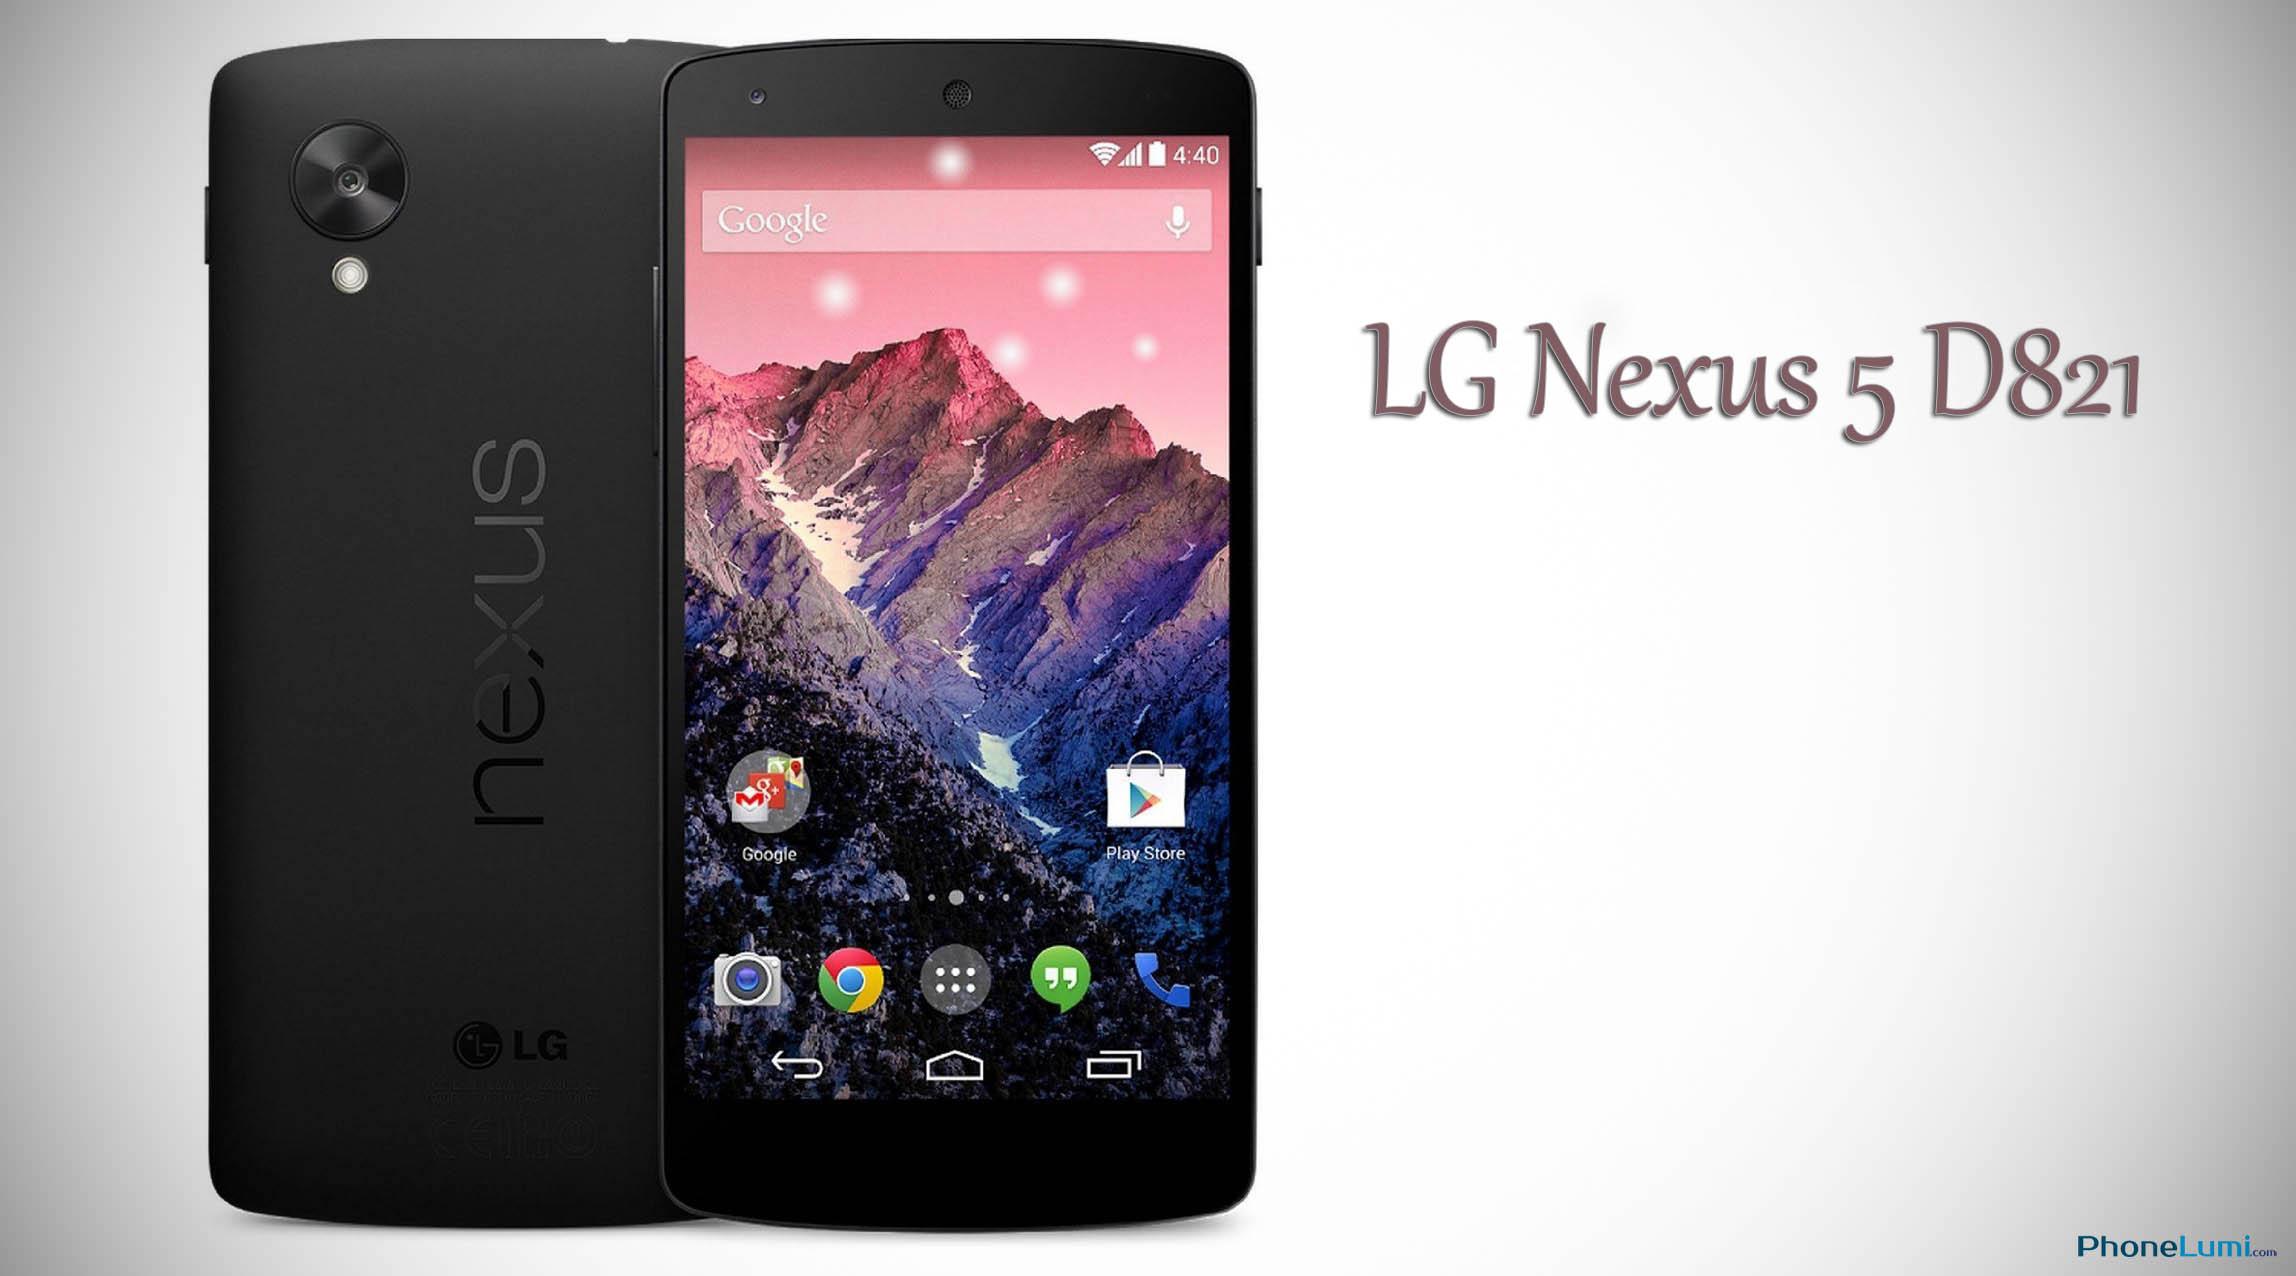 LG Nexus 5 D821 schematics manual